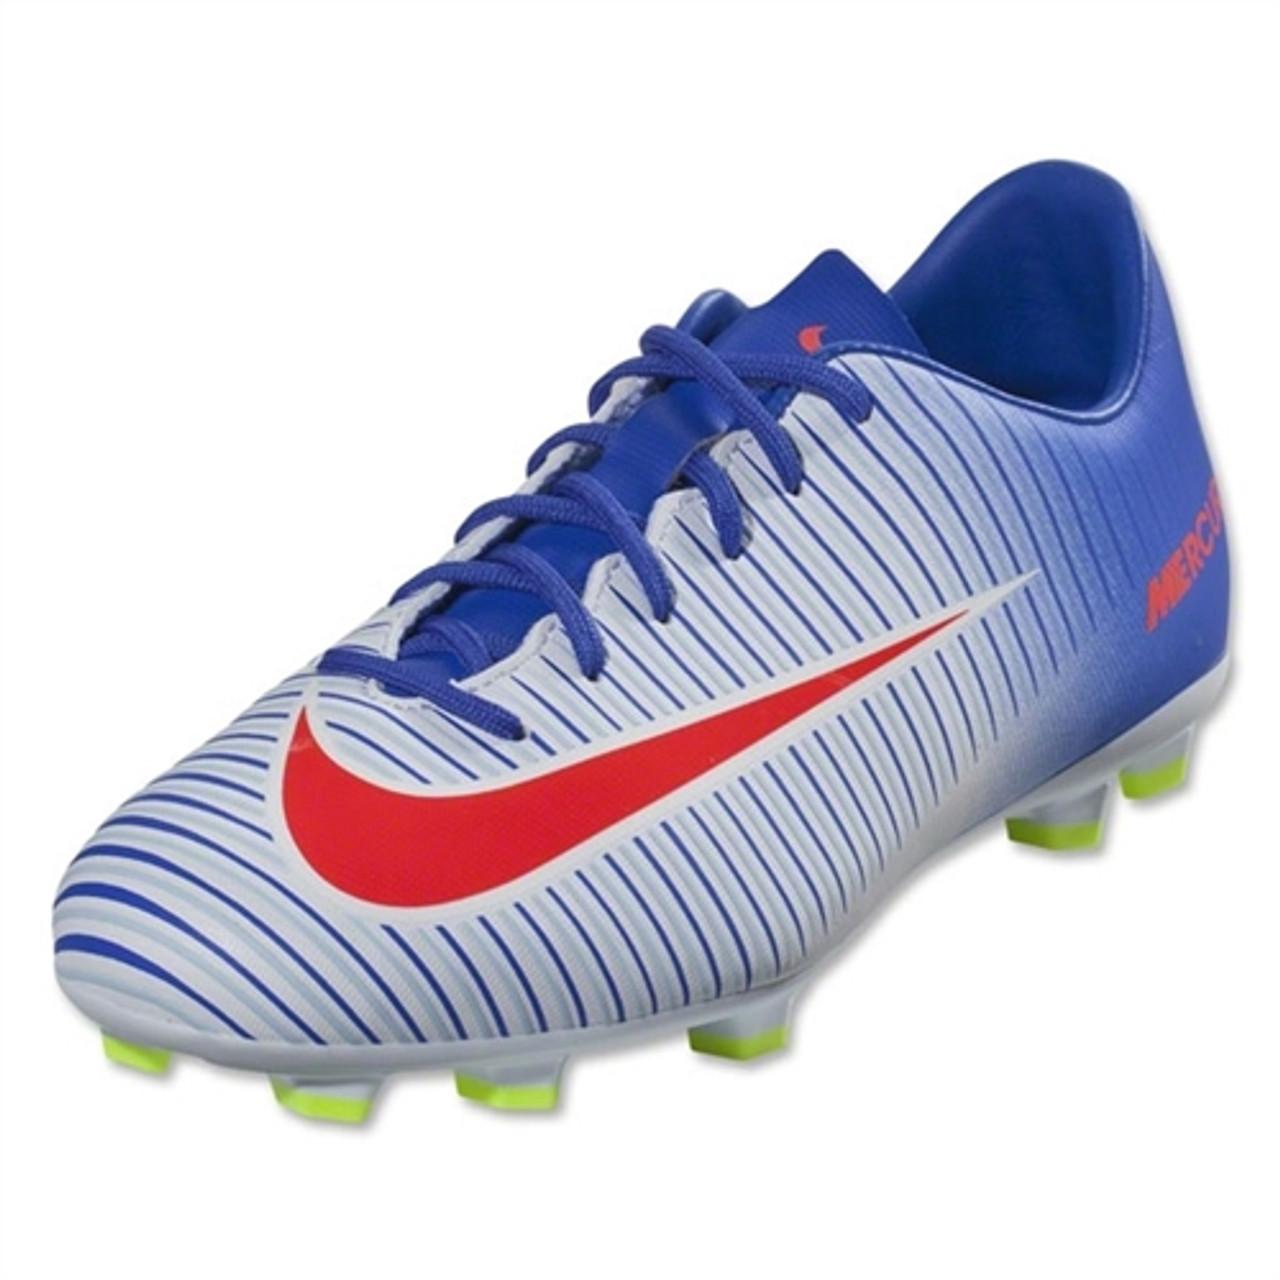 online store 4f0d3 5f0a8 Nike Jr Mercurial Vapor XI FG - White/Bright Crimson/Racer Blue (5818)